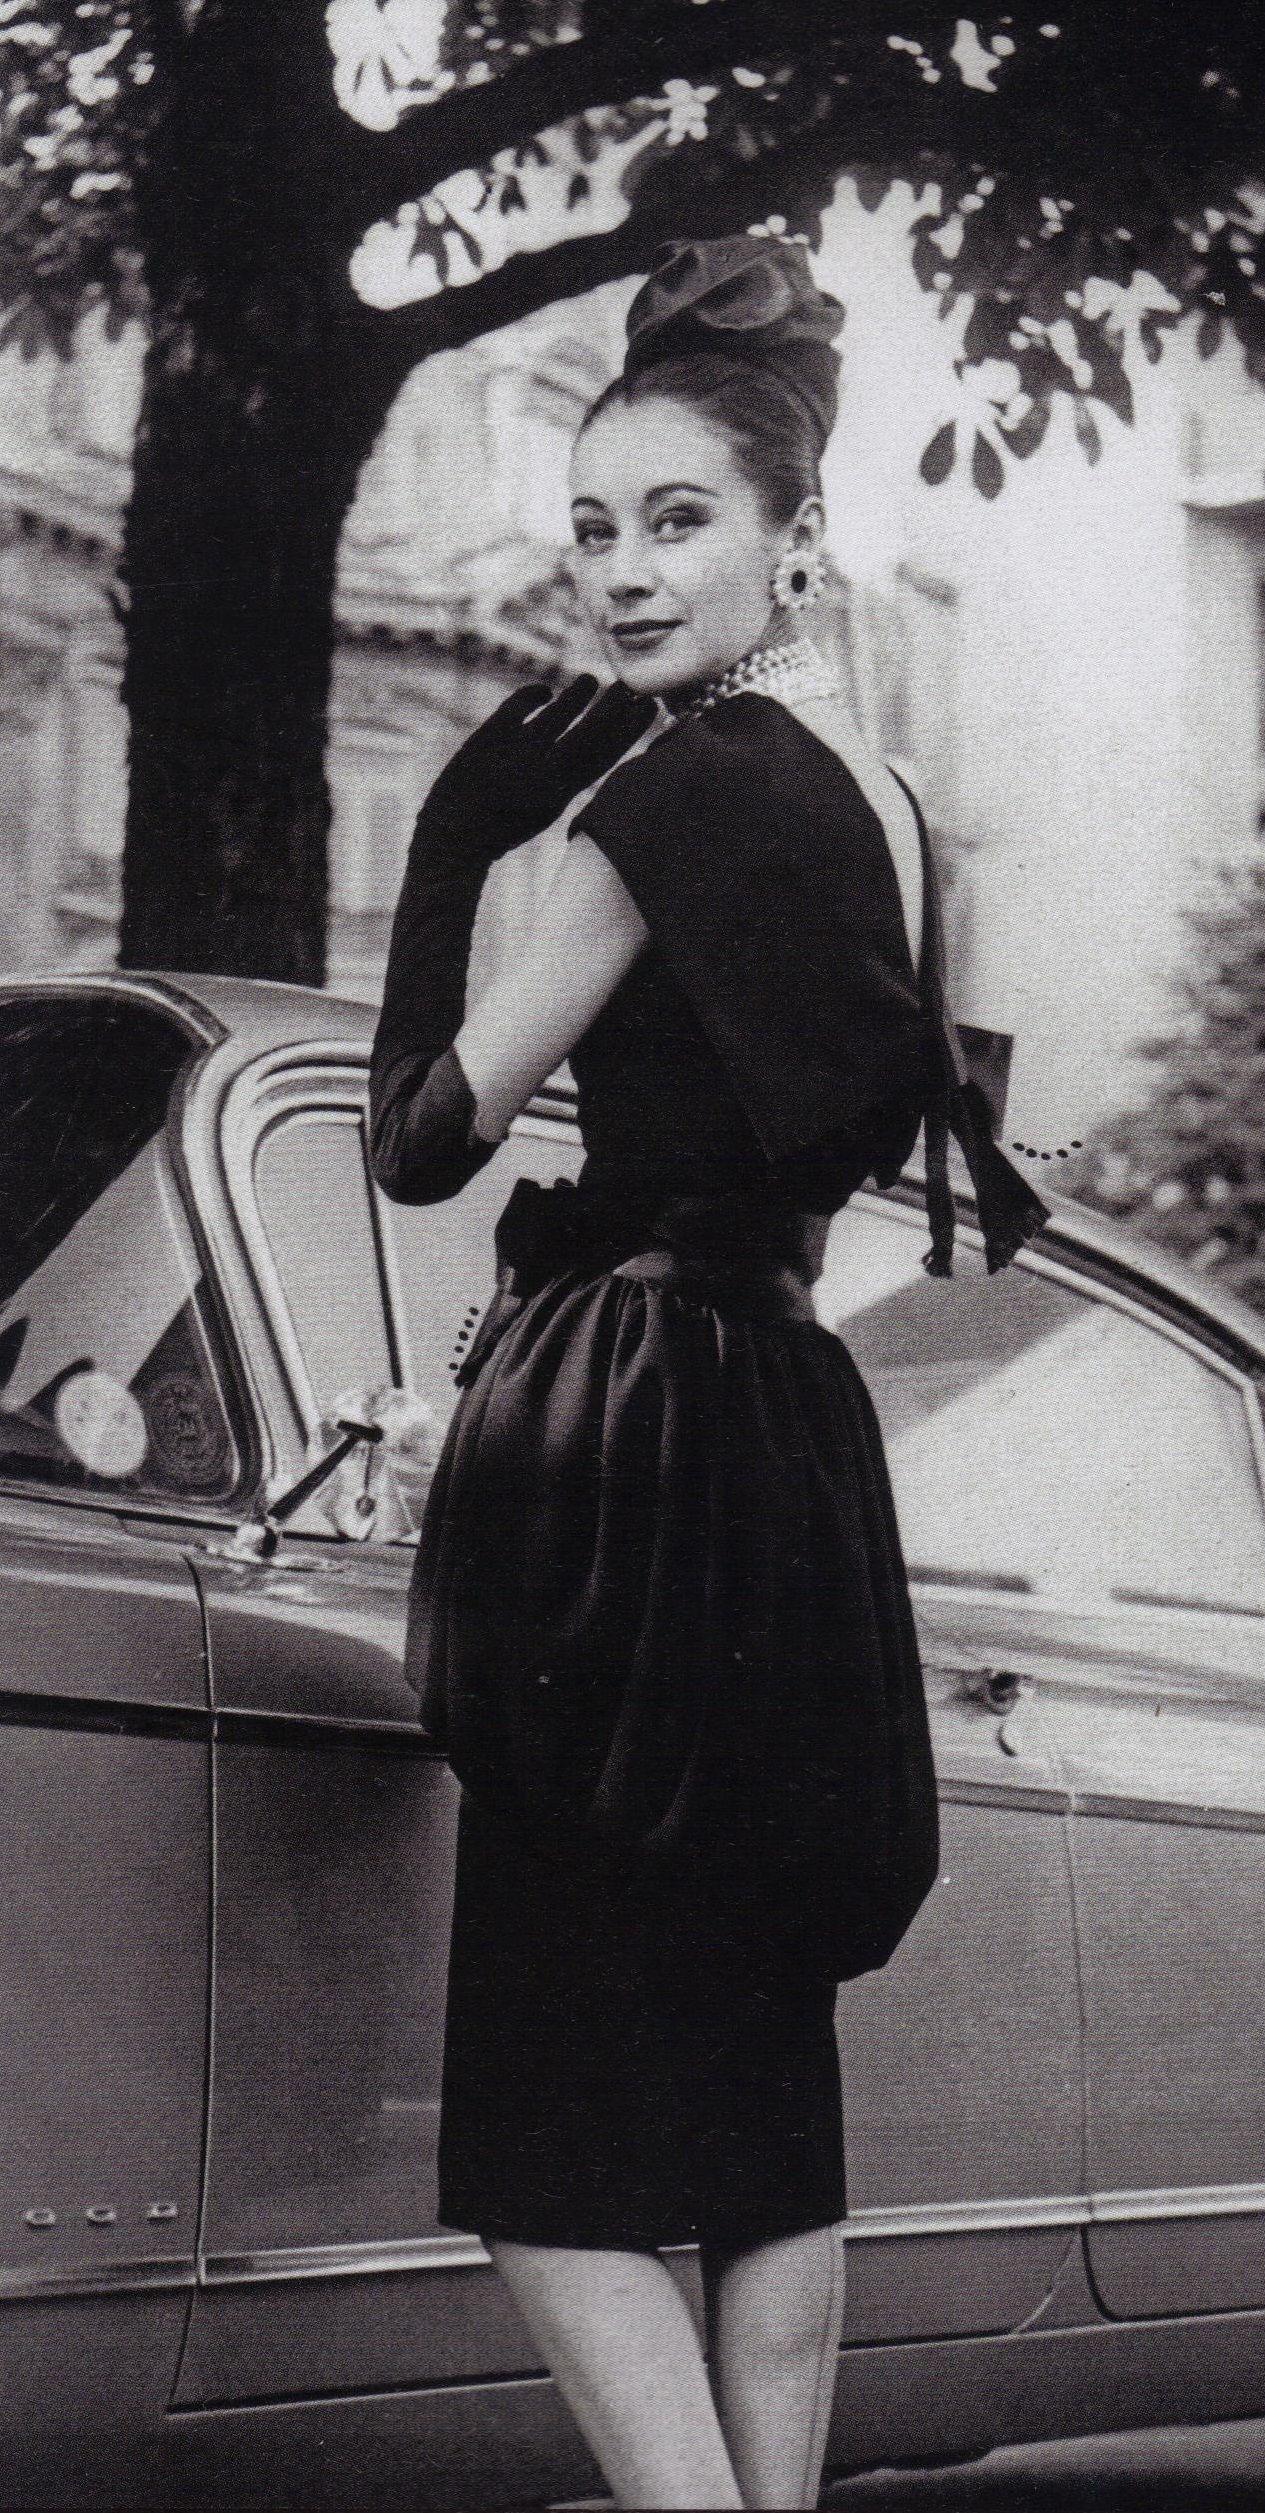 Black dress we heart it - 1959 Dior Dress By Ysl 50s 60s Designer Couture Black Dress Cocktail Black Velvet Bow